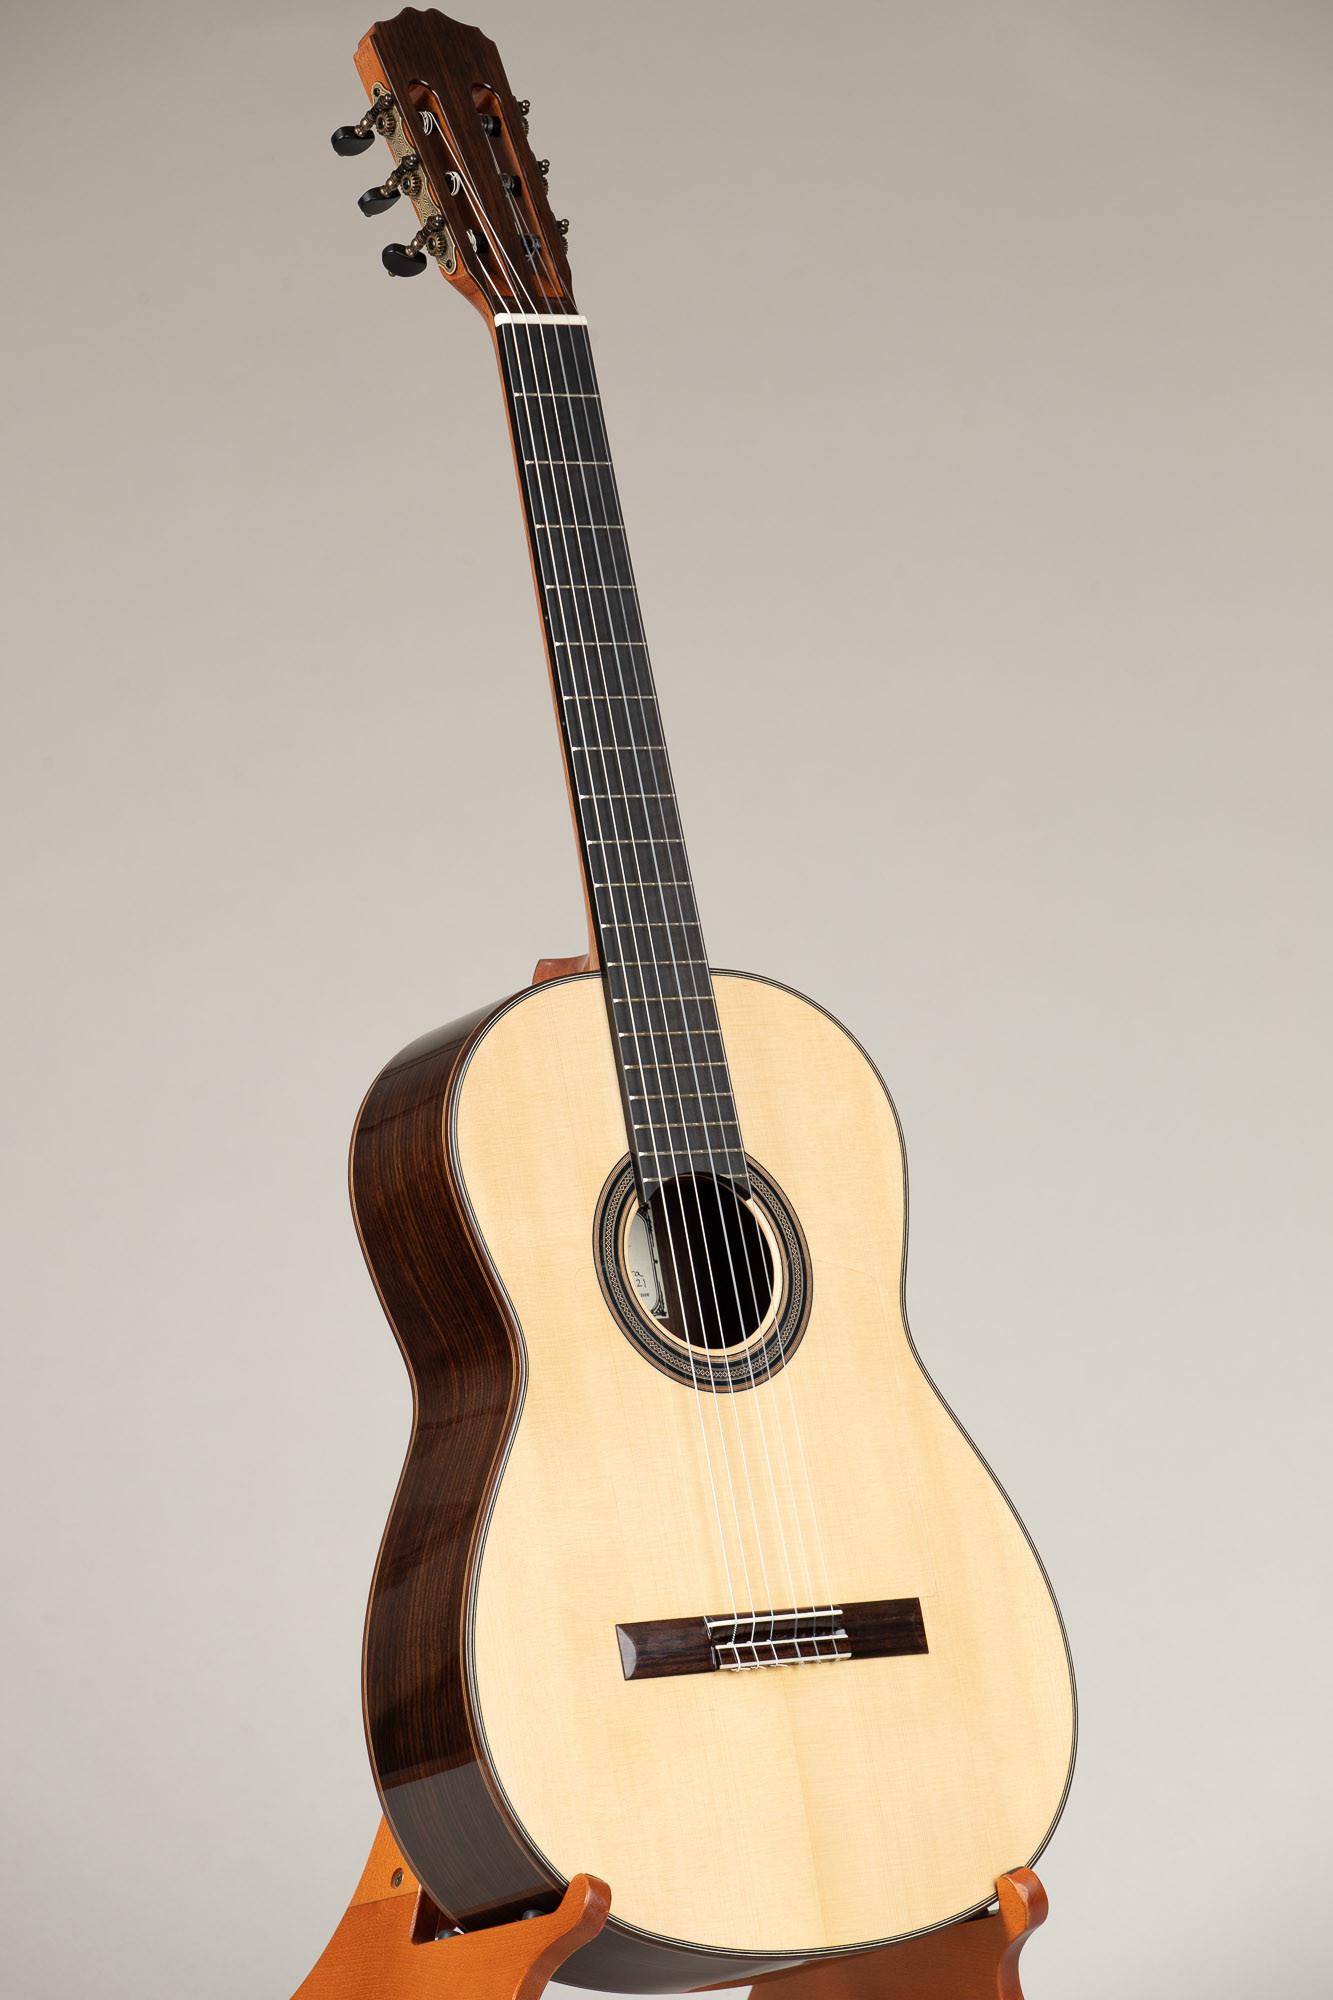 Guitarras Romero Flamenco Guitar (La Negra 23NSI21)